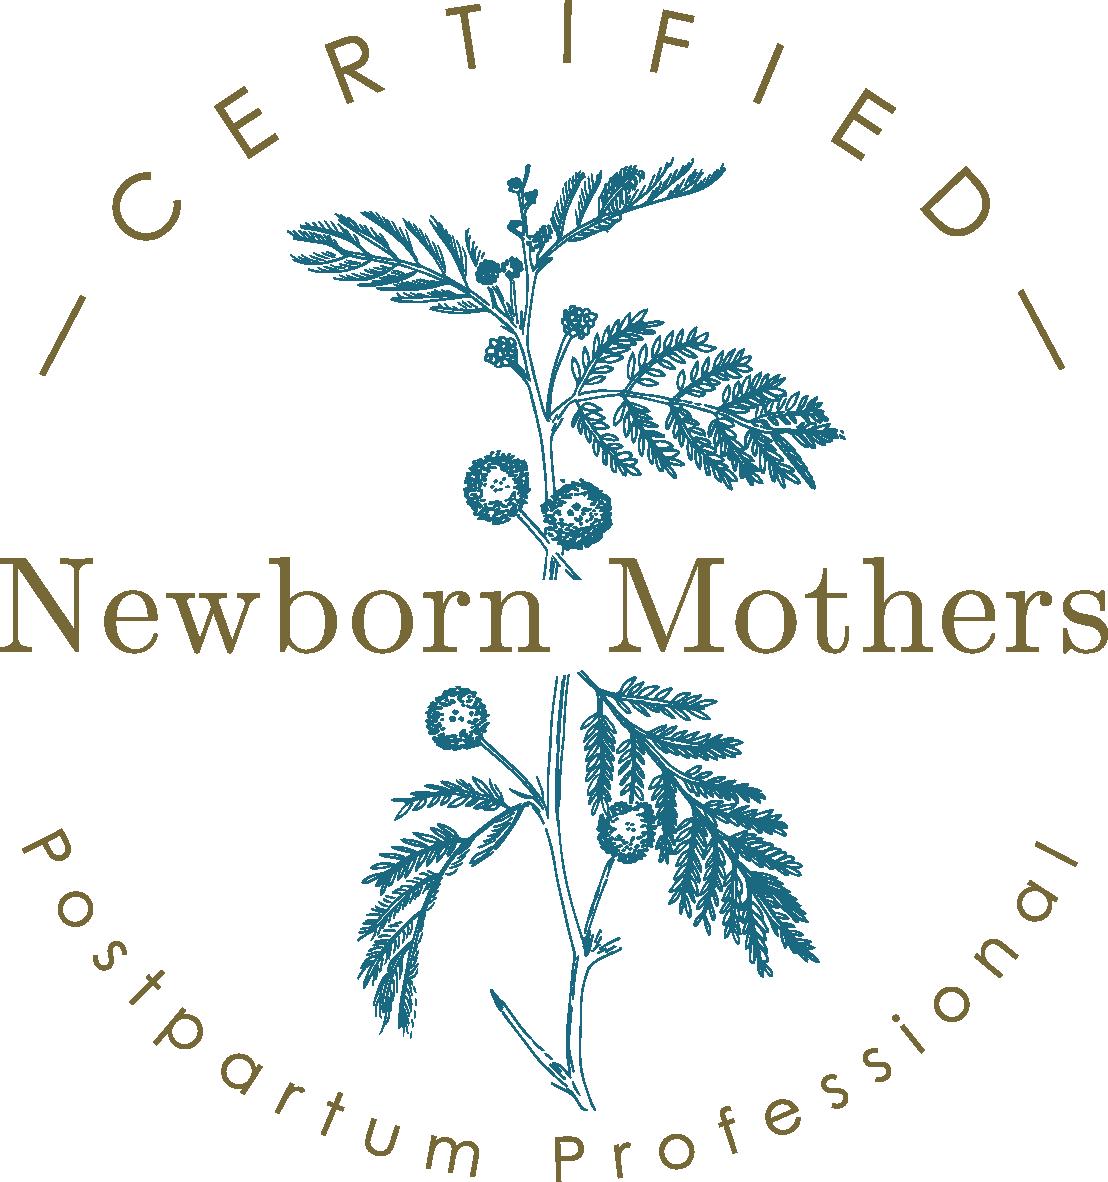 Badgecolor-Newborn-outlines.png